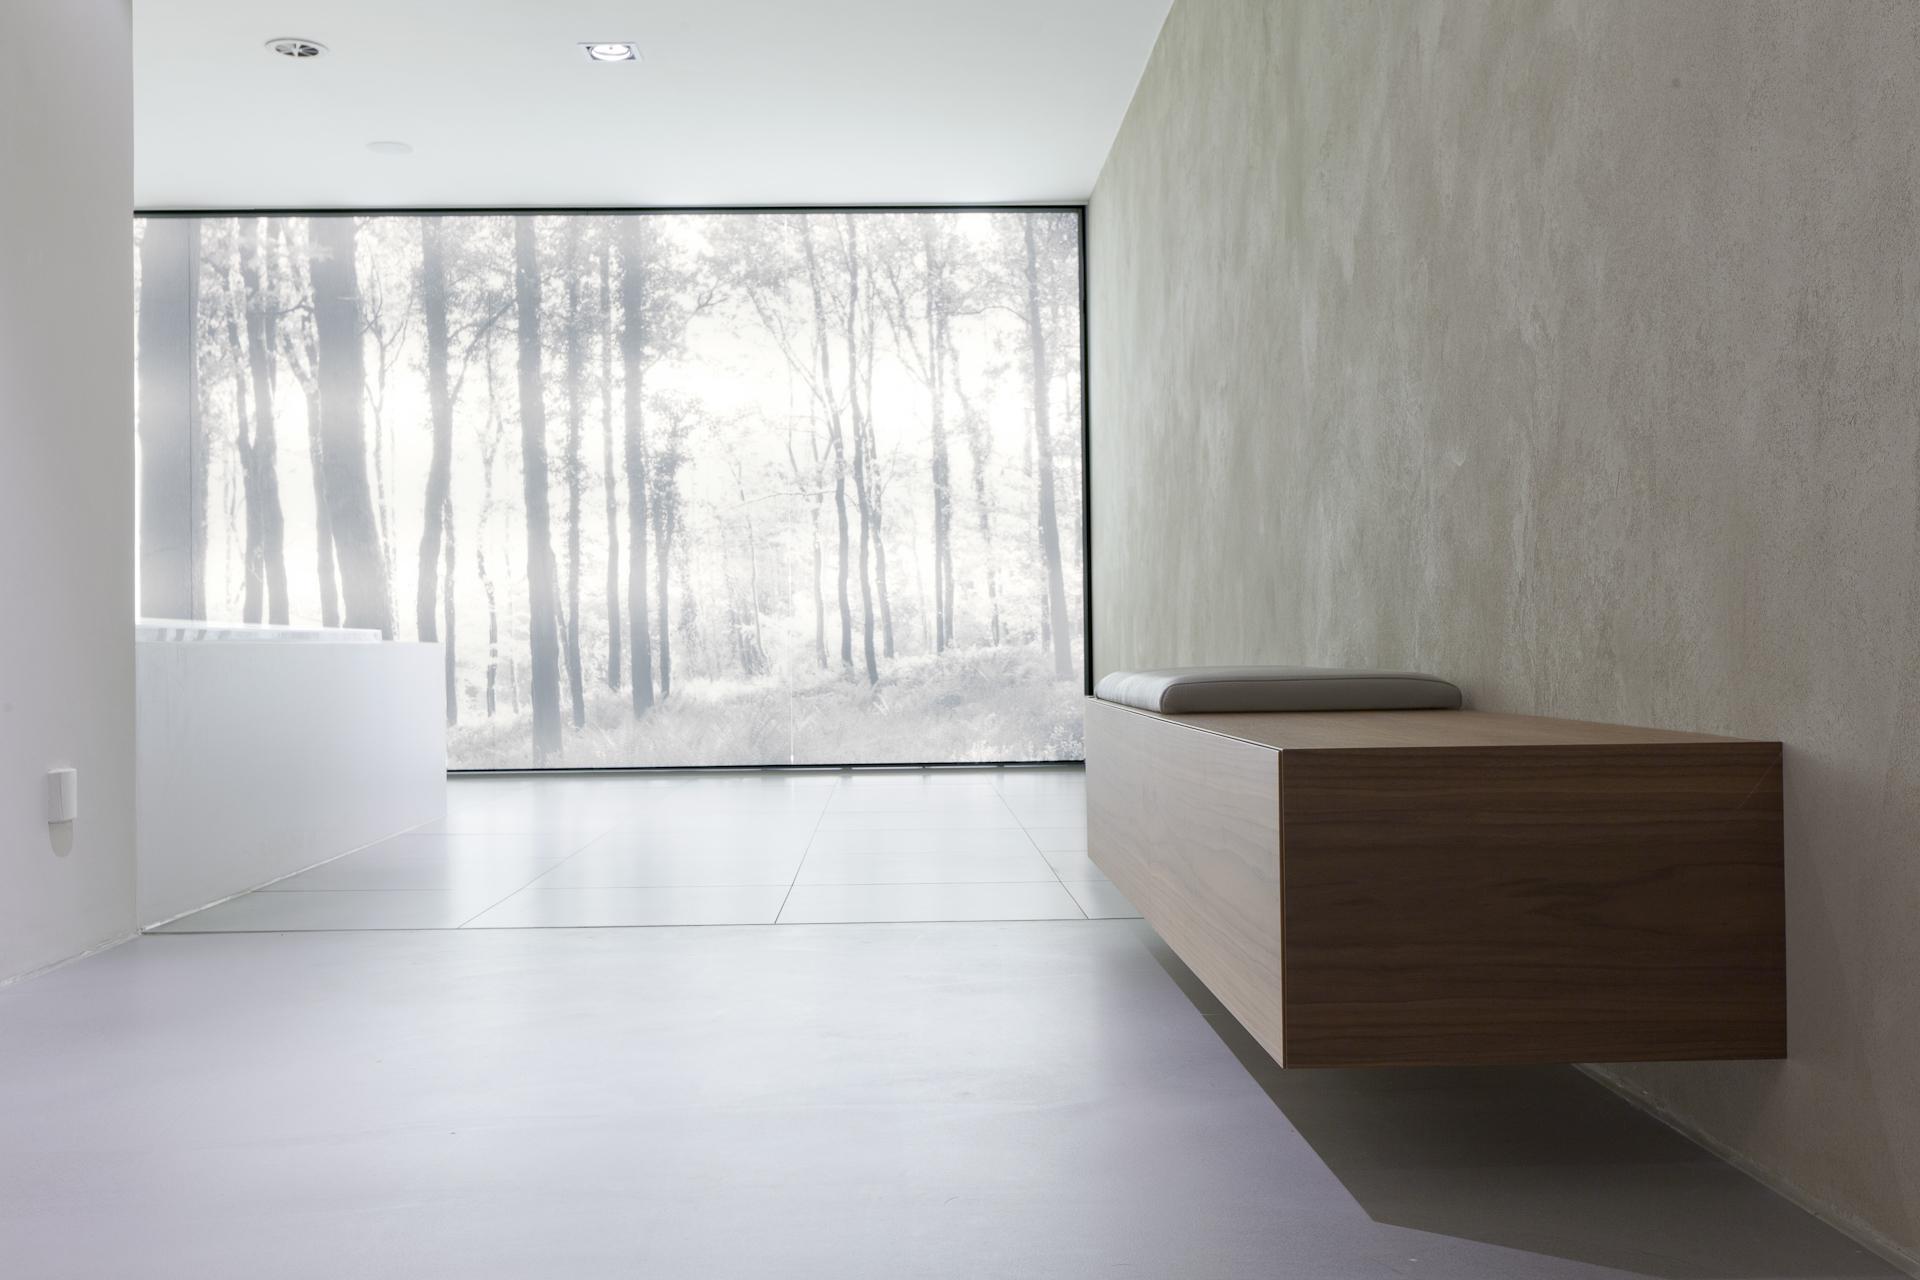 Peter_Leenders_Fotografie_Wrede_Architekten-13